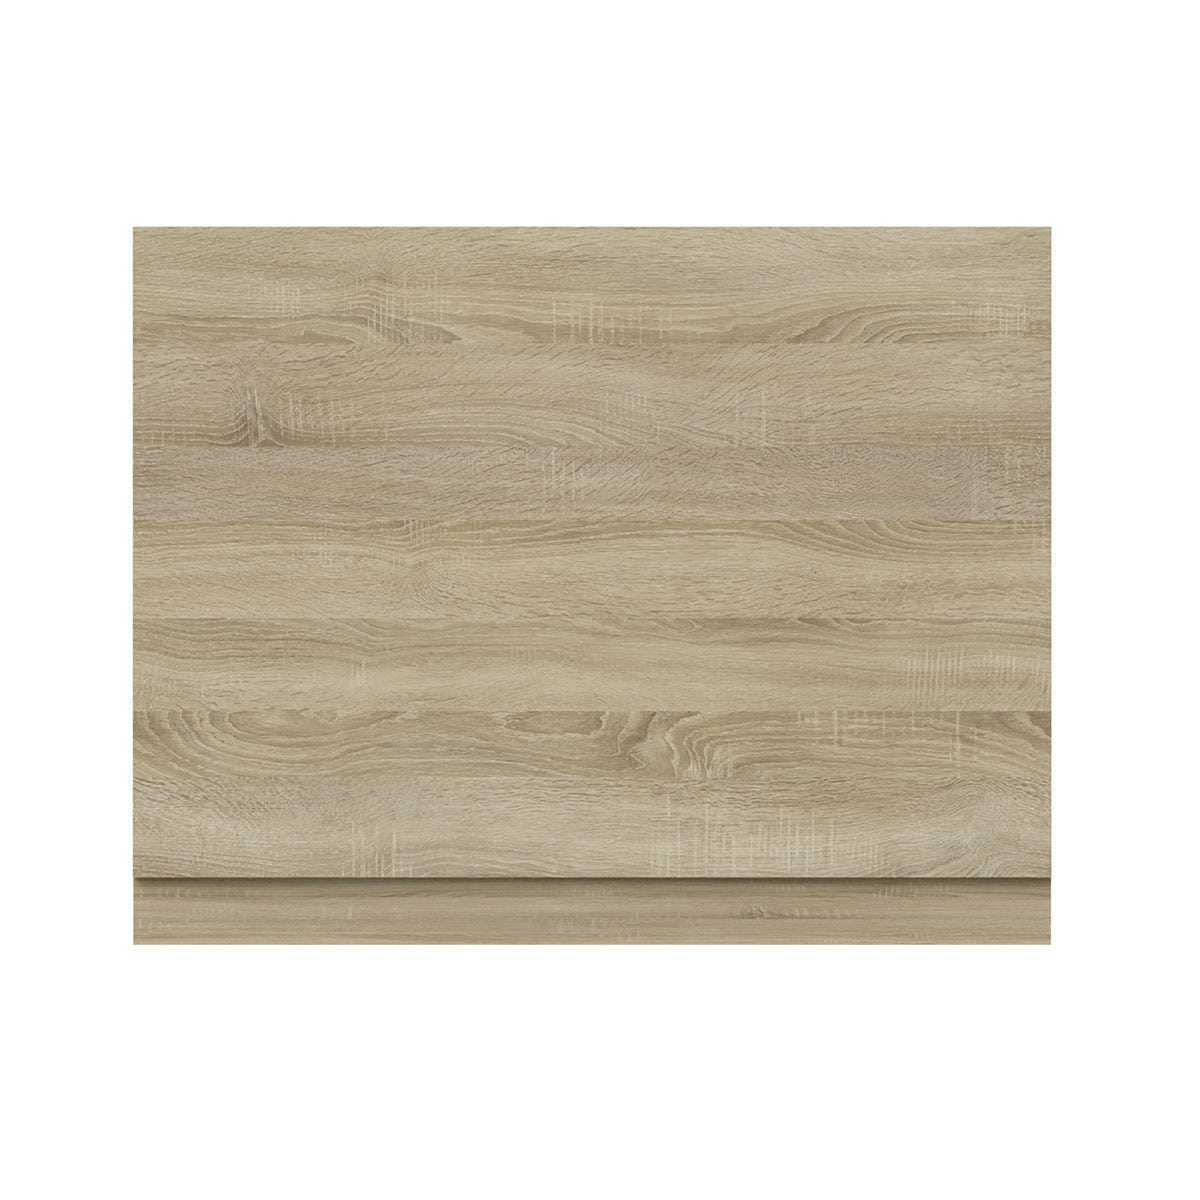 Orchard Wye oak bath end panel 680mm